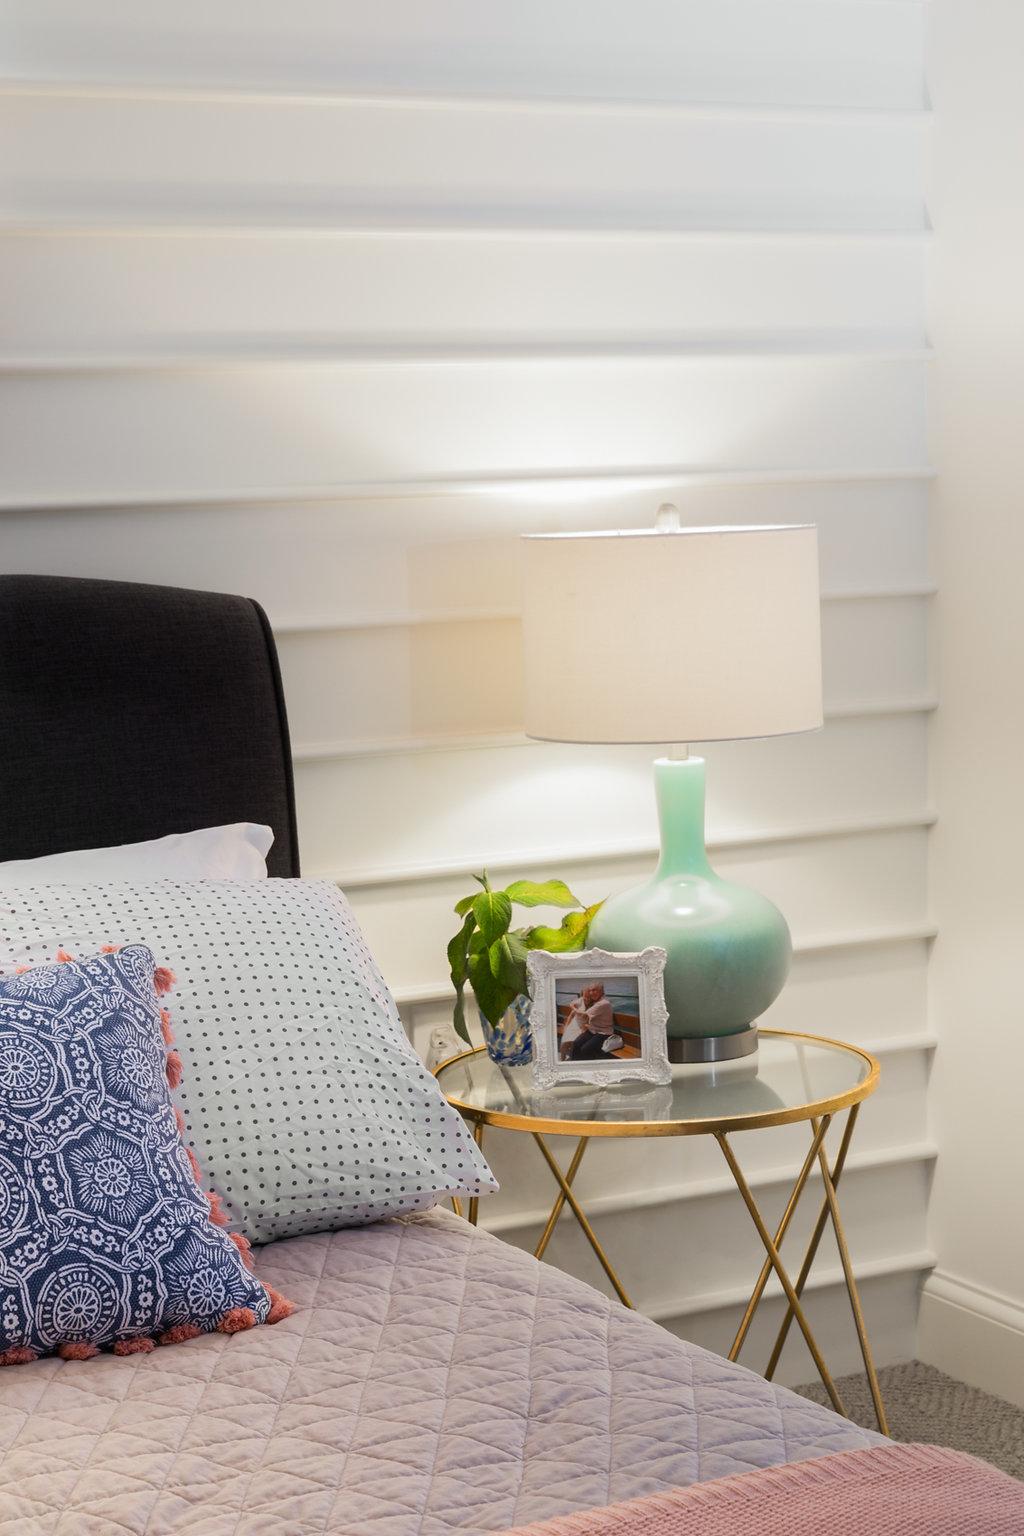 Boo & Rook bridgewater boston massachusetts  interior design family basement design guest bedroom scandinavian shiplap.jpg